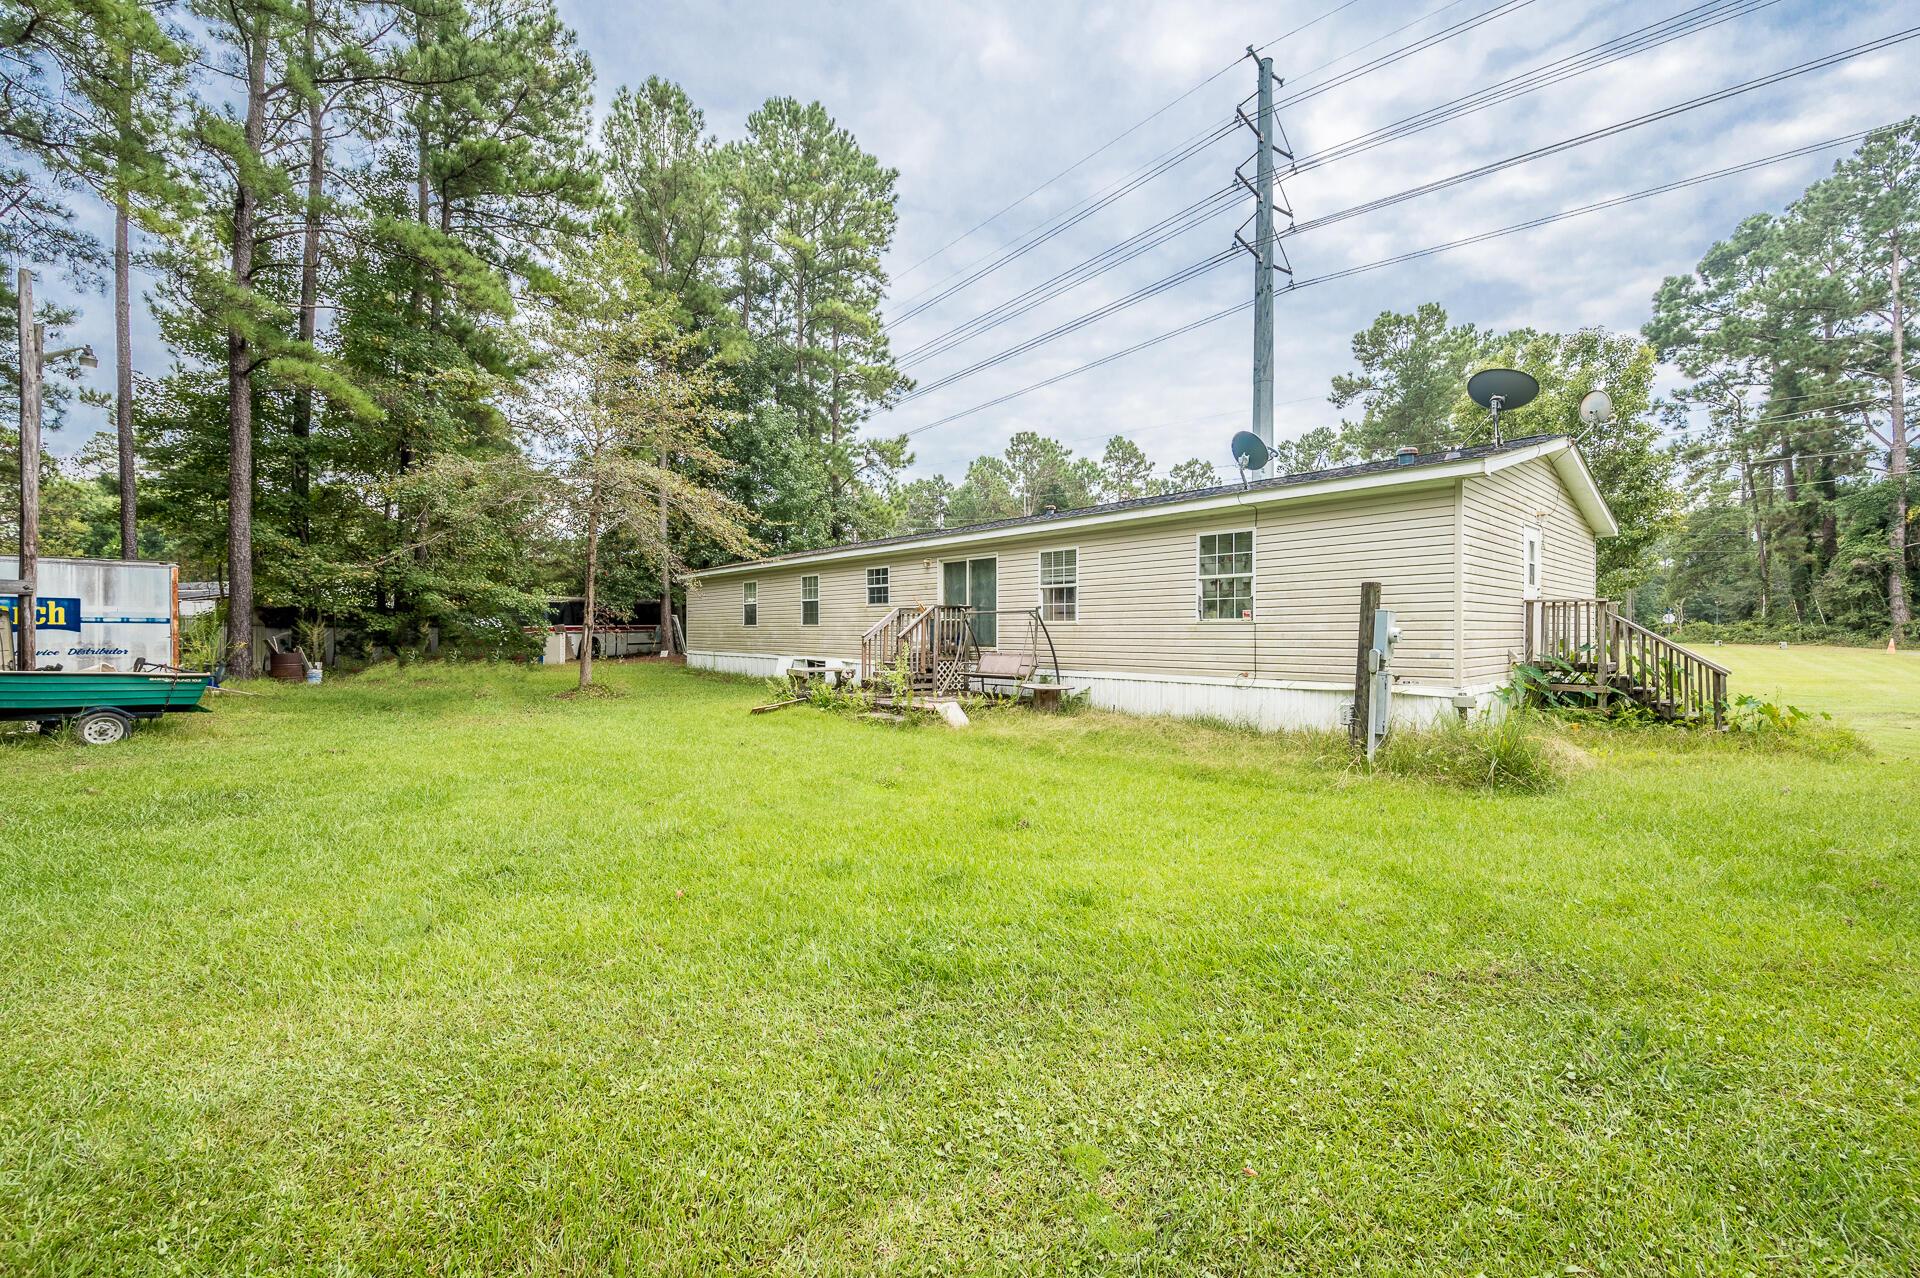 Clemson Terrace Homes For Sale - 250 Medina, Summerville, SC - 12